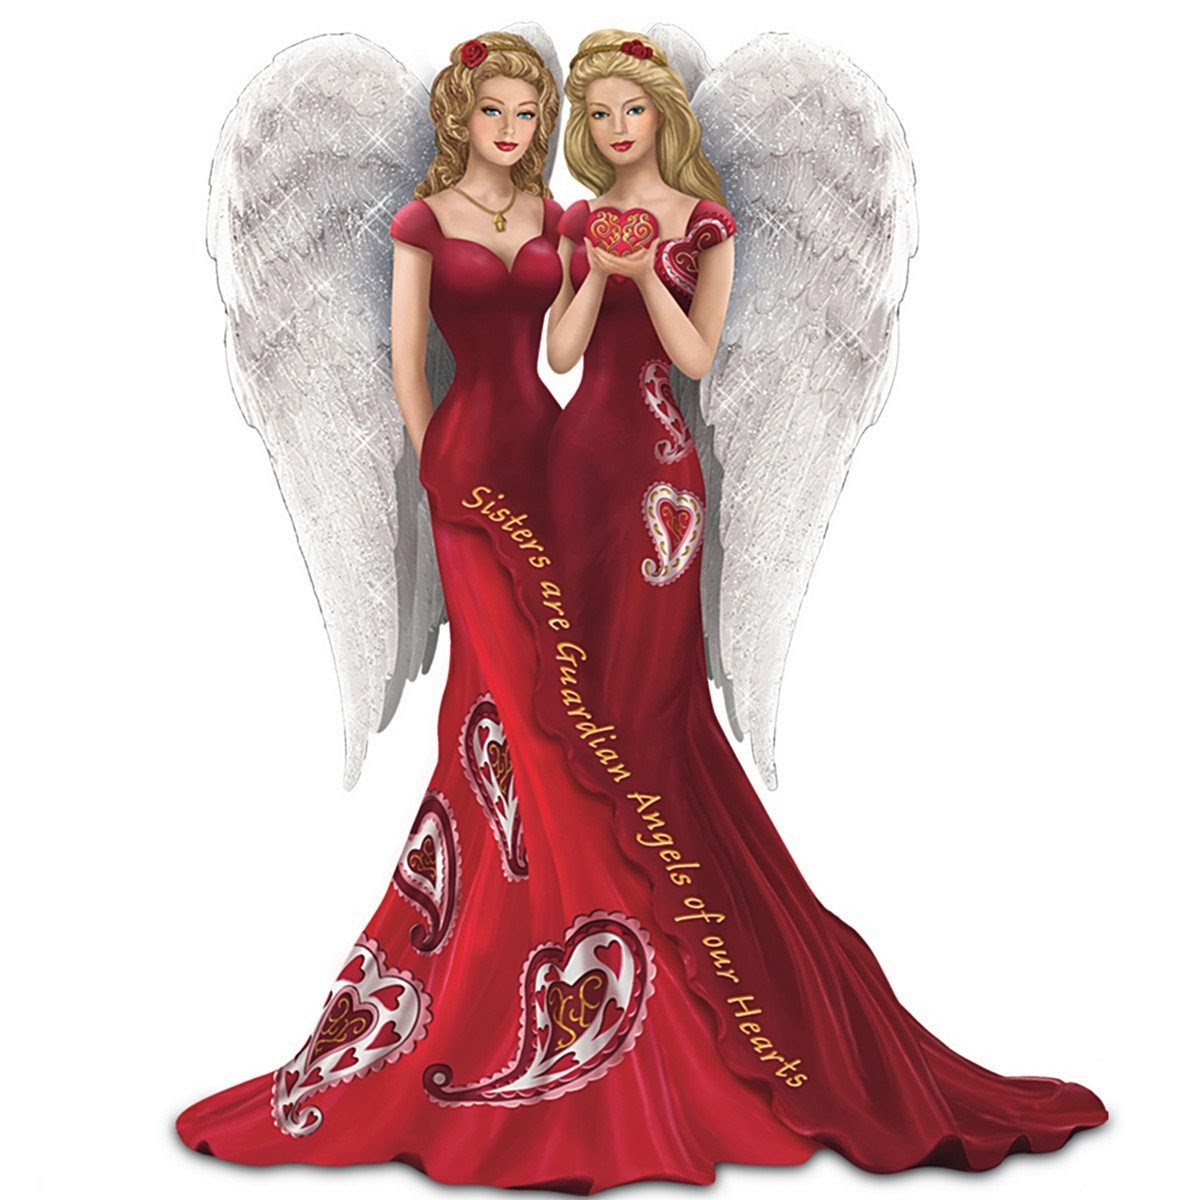 Thomas Kinkade Online Catalog: Sisters Are Guardian Angels ...